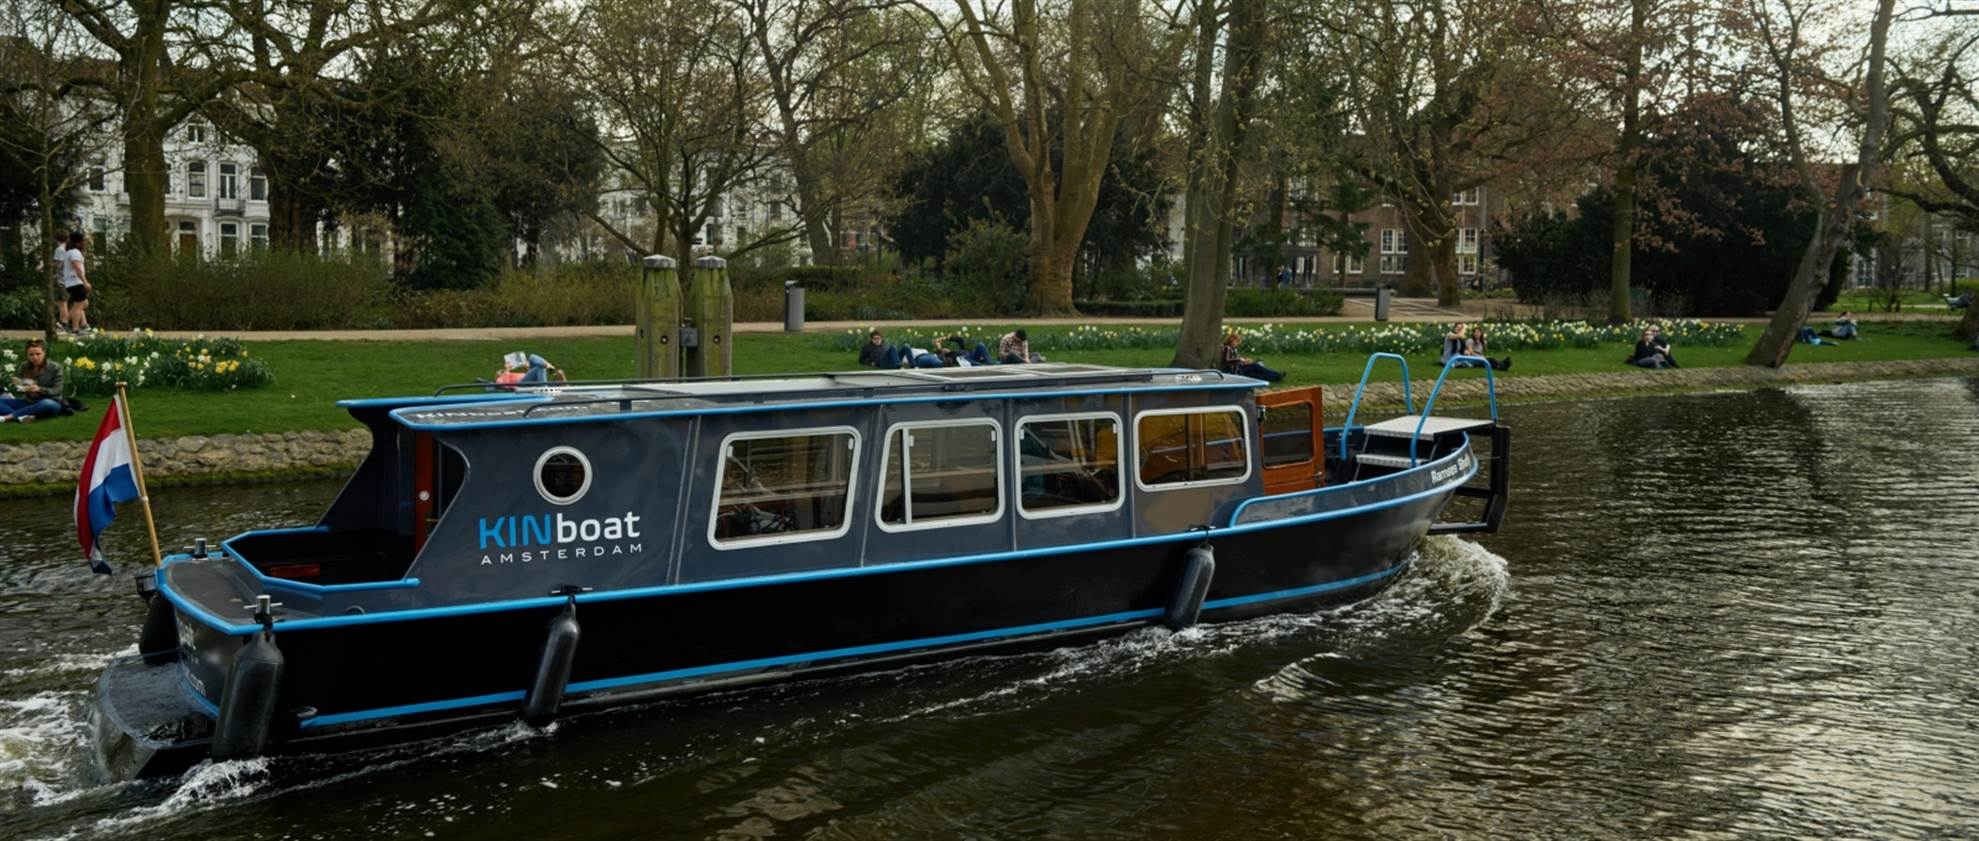 Cruzeiro no Canal - pequeno barco privado